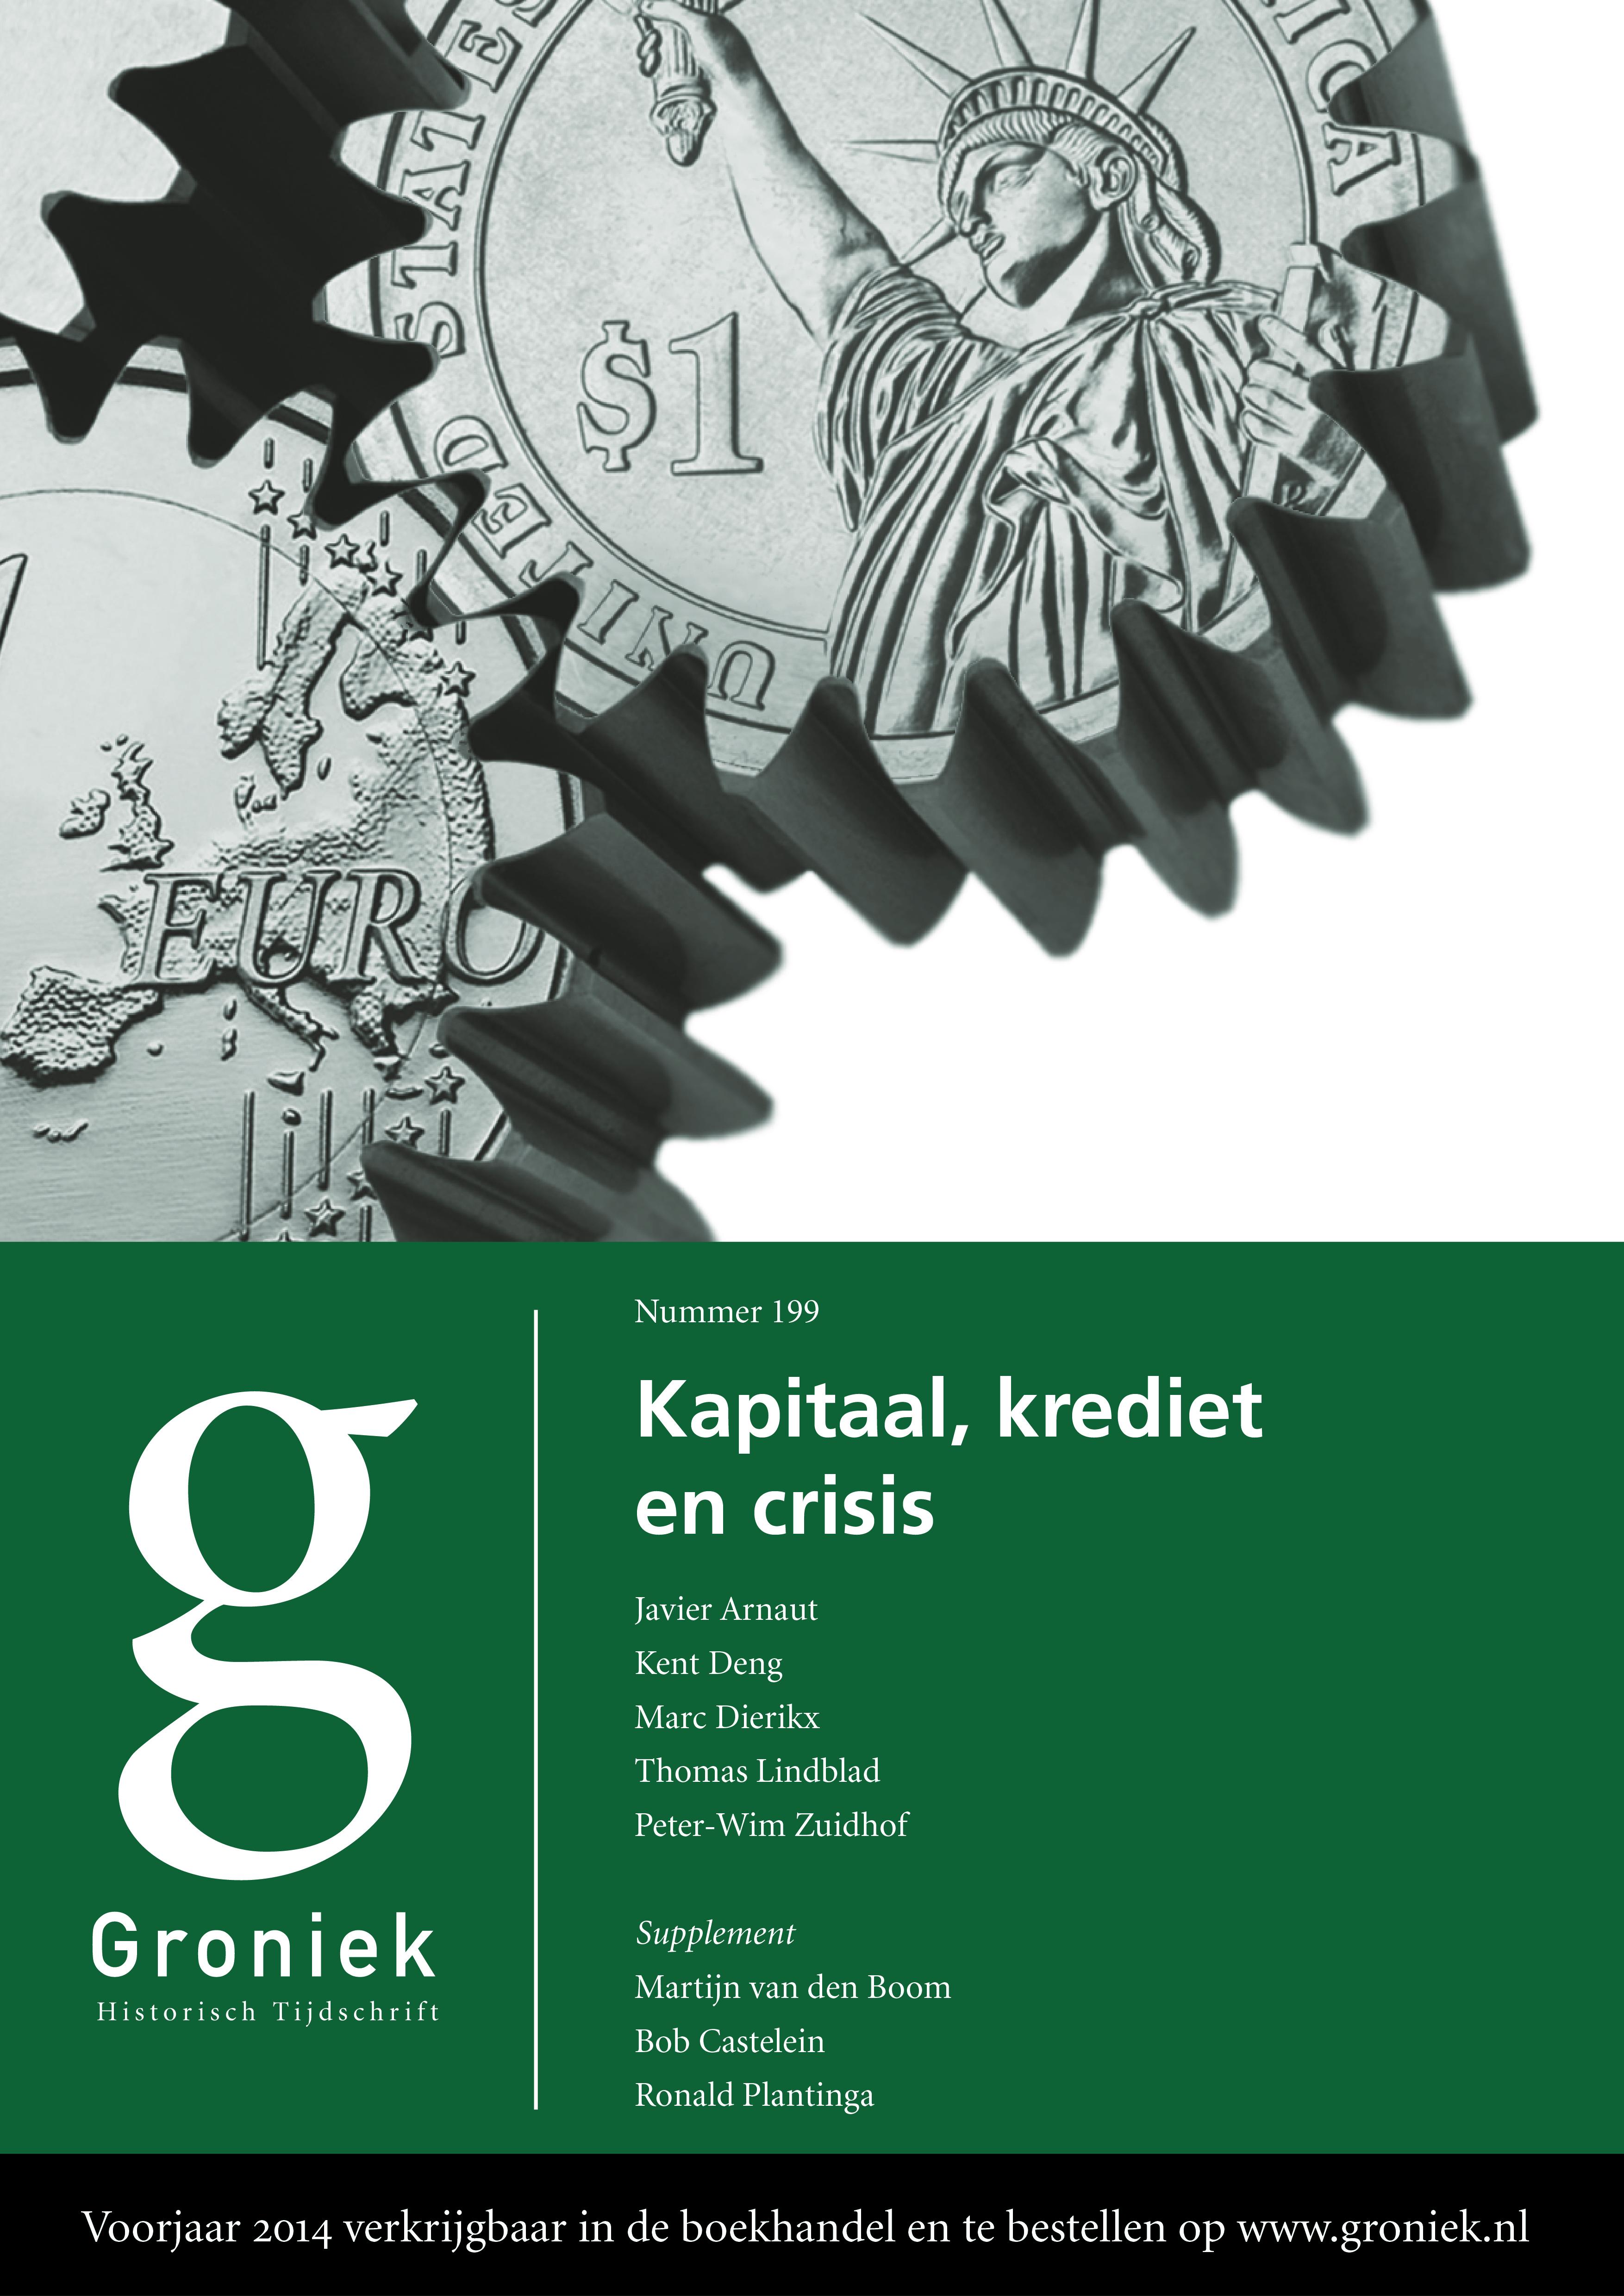 Kapitaal-krediet-en-crisis-affiche1